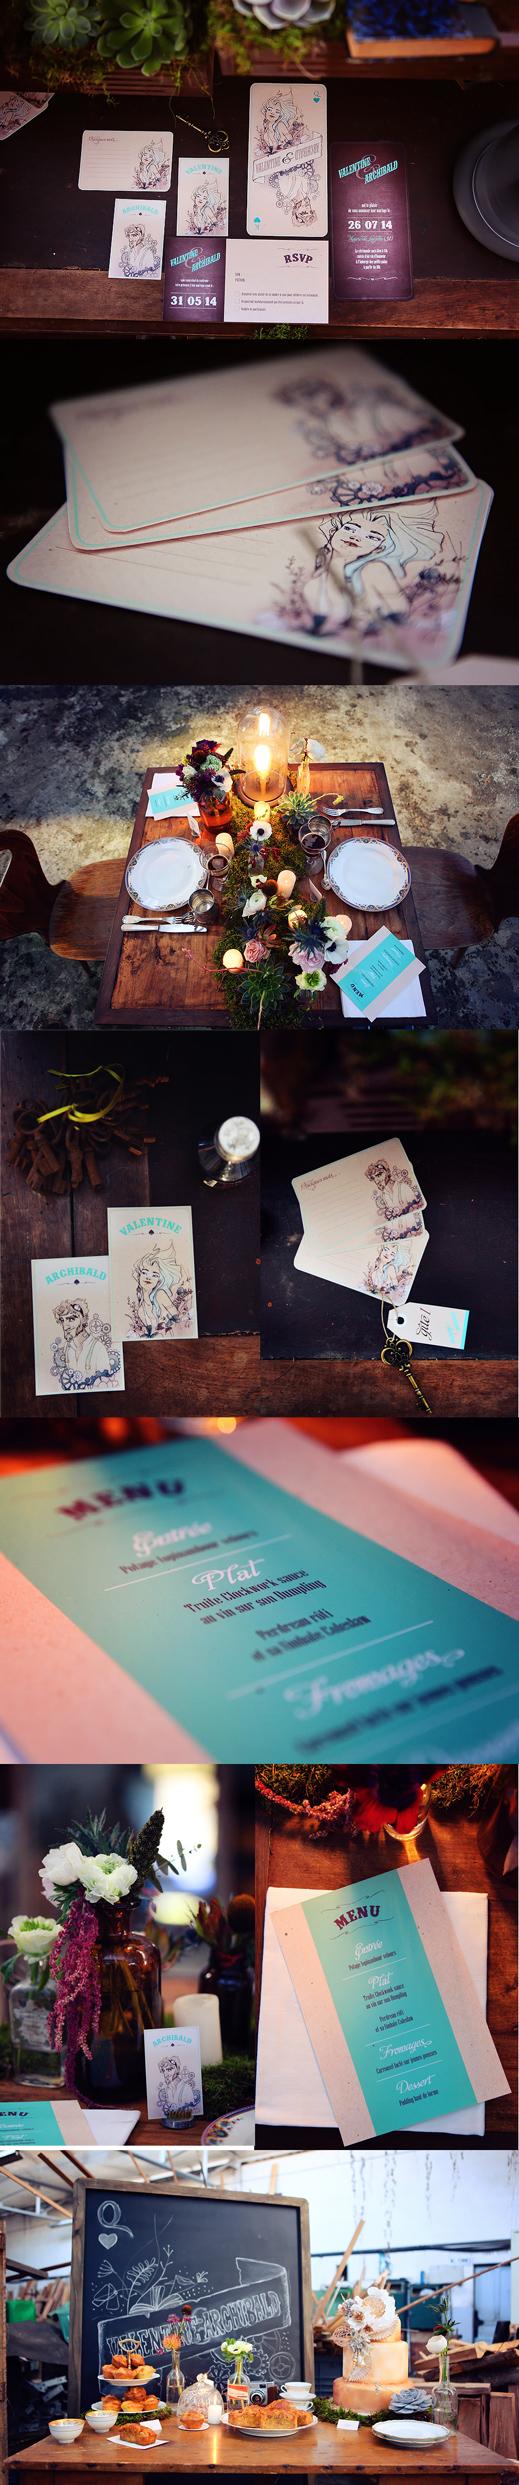 steampunk-wedding_photocomplet